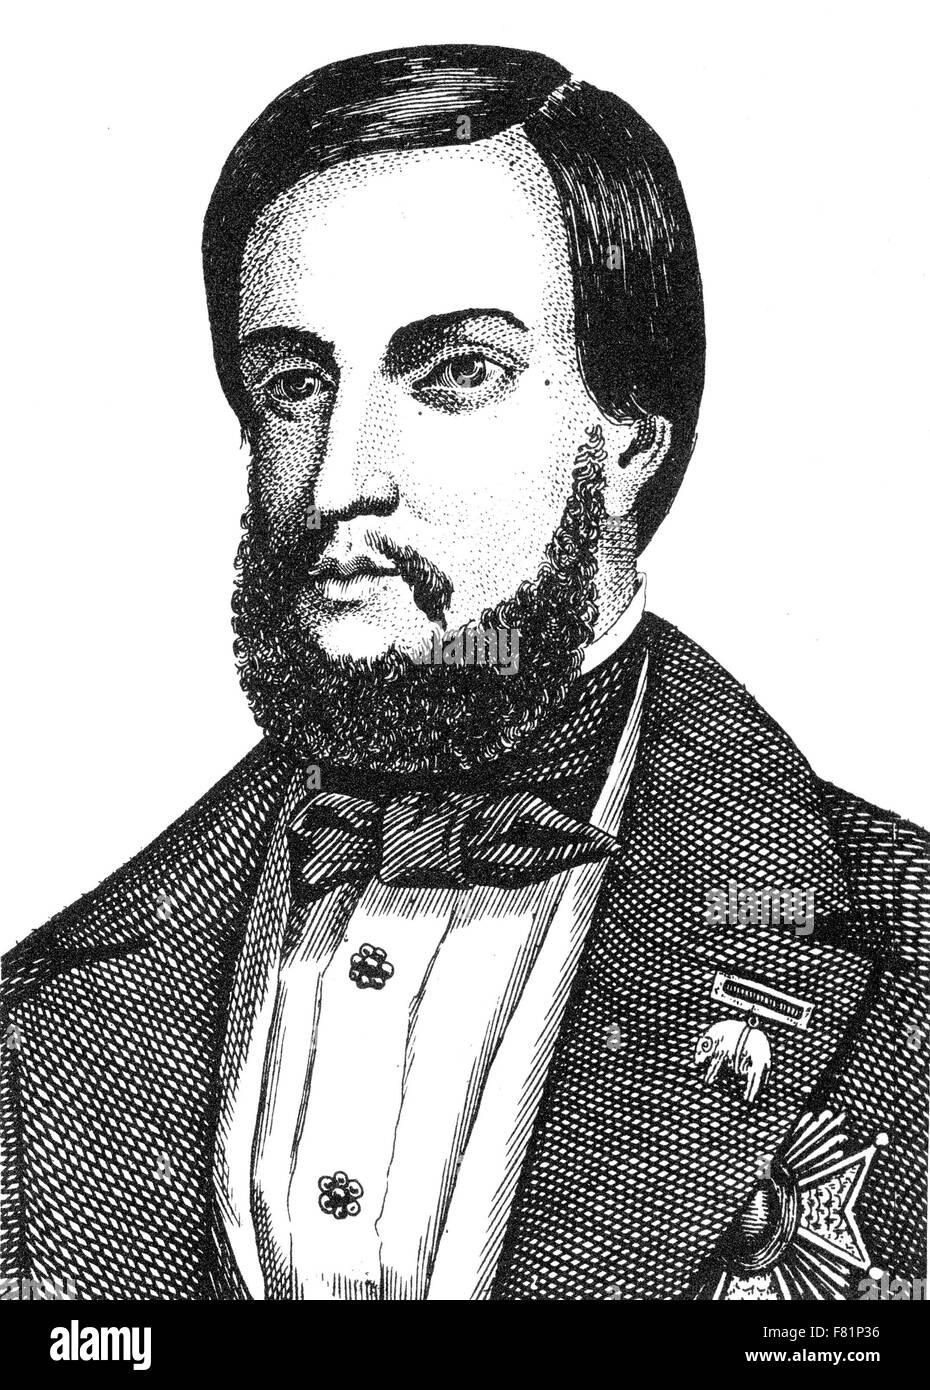 EMPEROR PEDRO II OF BRAZIL (1825-1891) - Stock Image